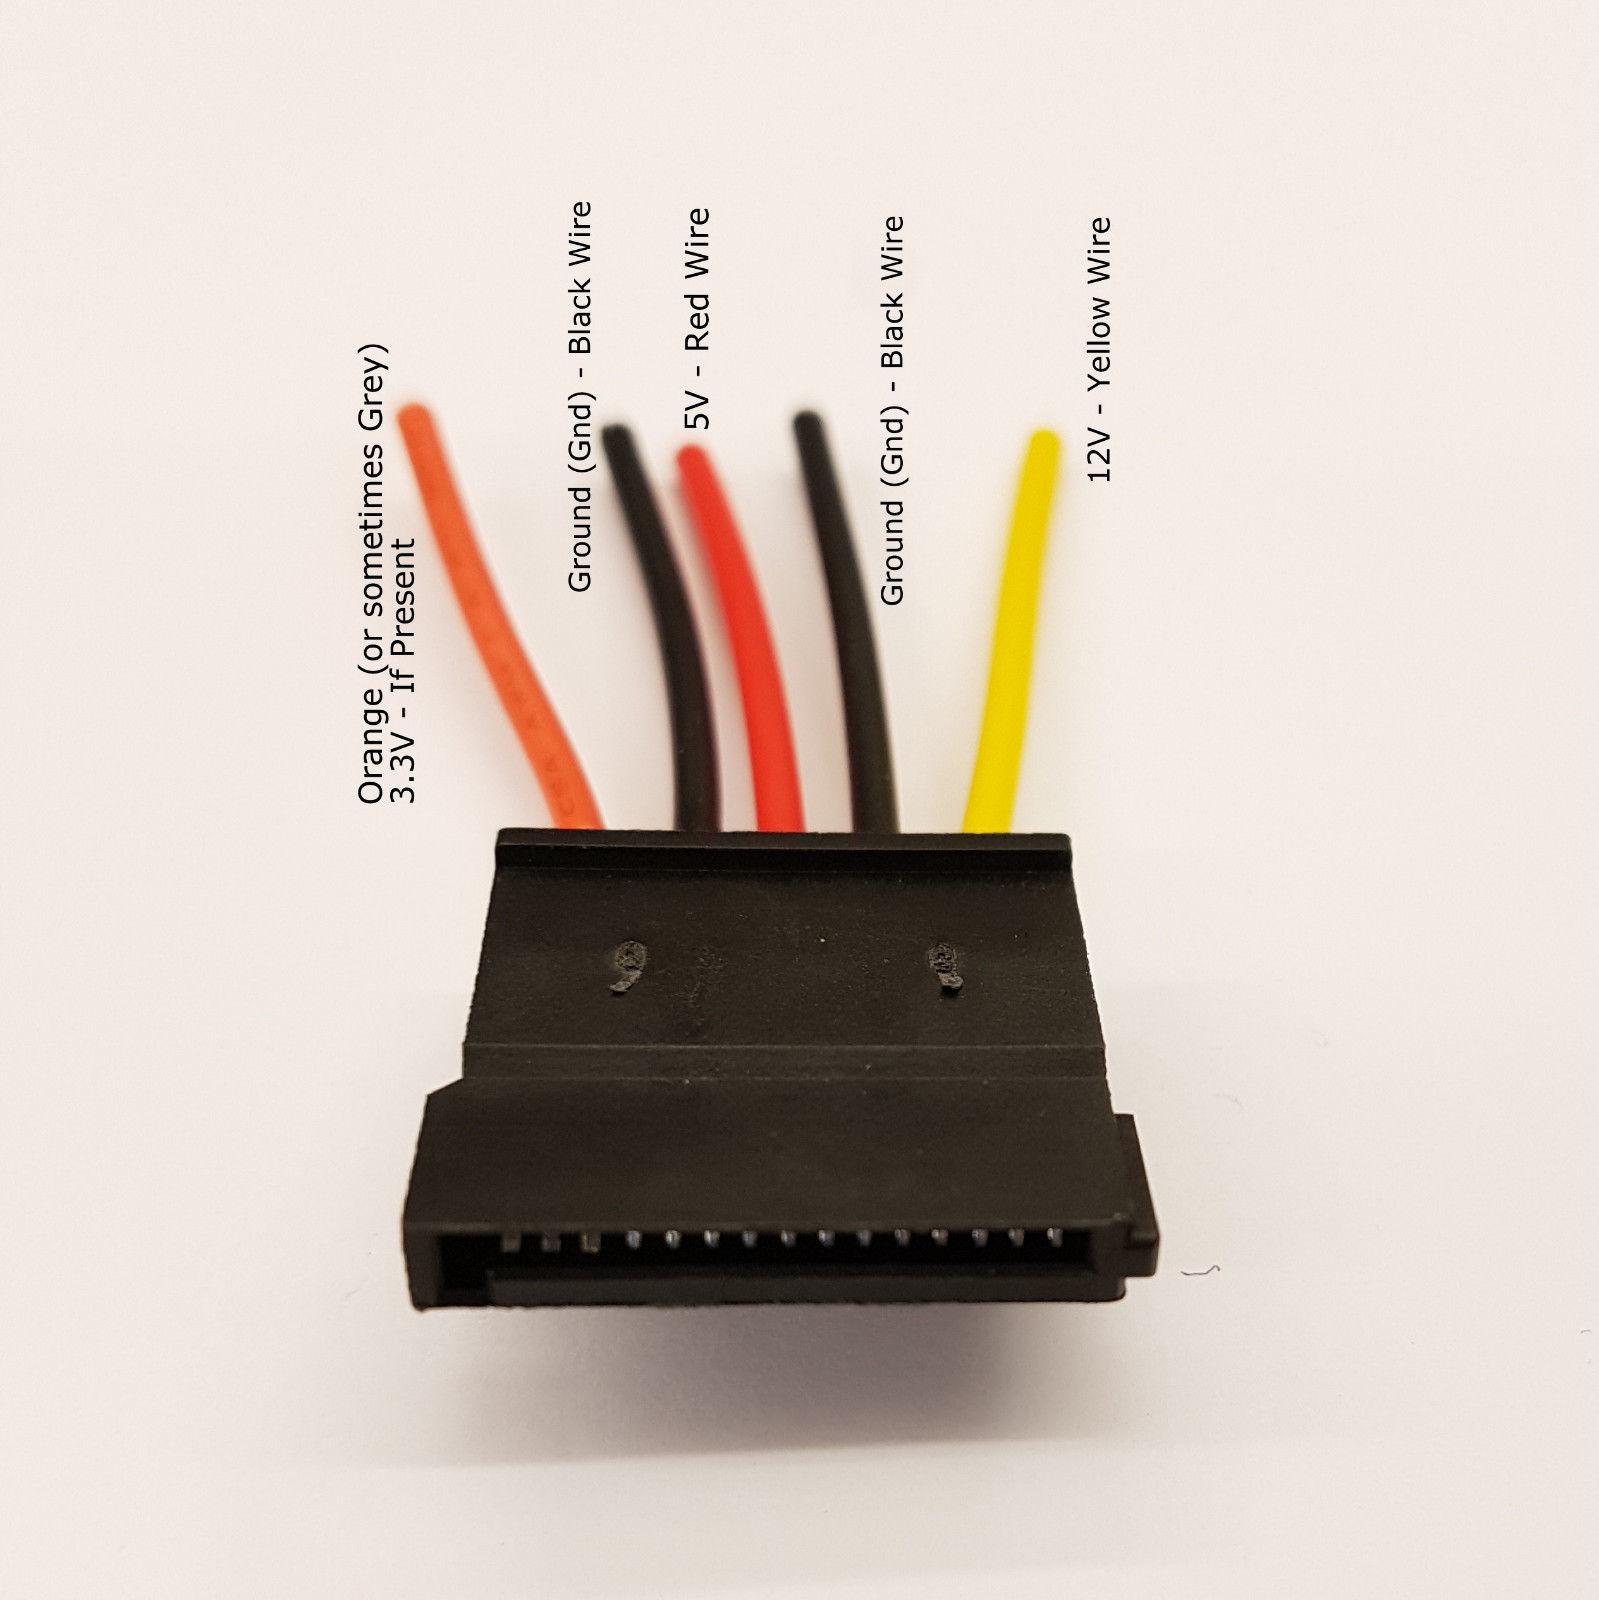 DIY STRAIGHT MALE SATA PC PSU POWER SUPPLY CONNECTOR + CAPS - PK OF 2